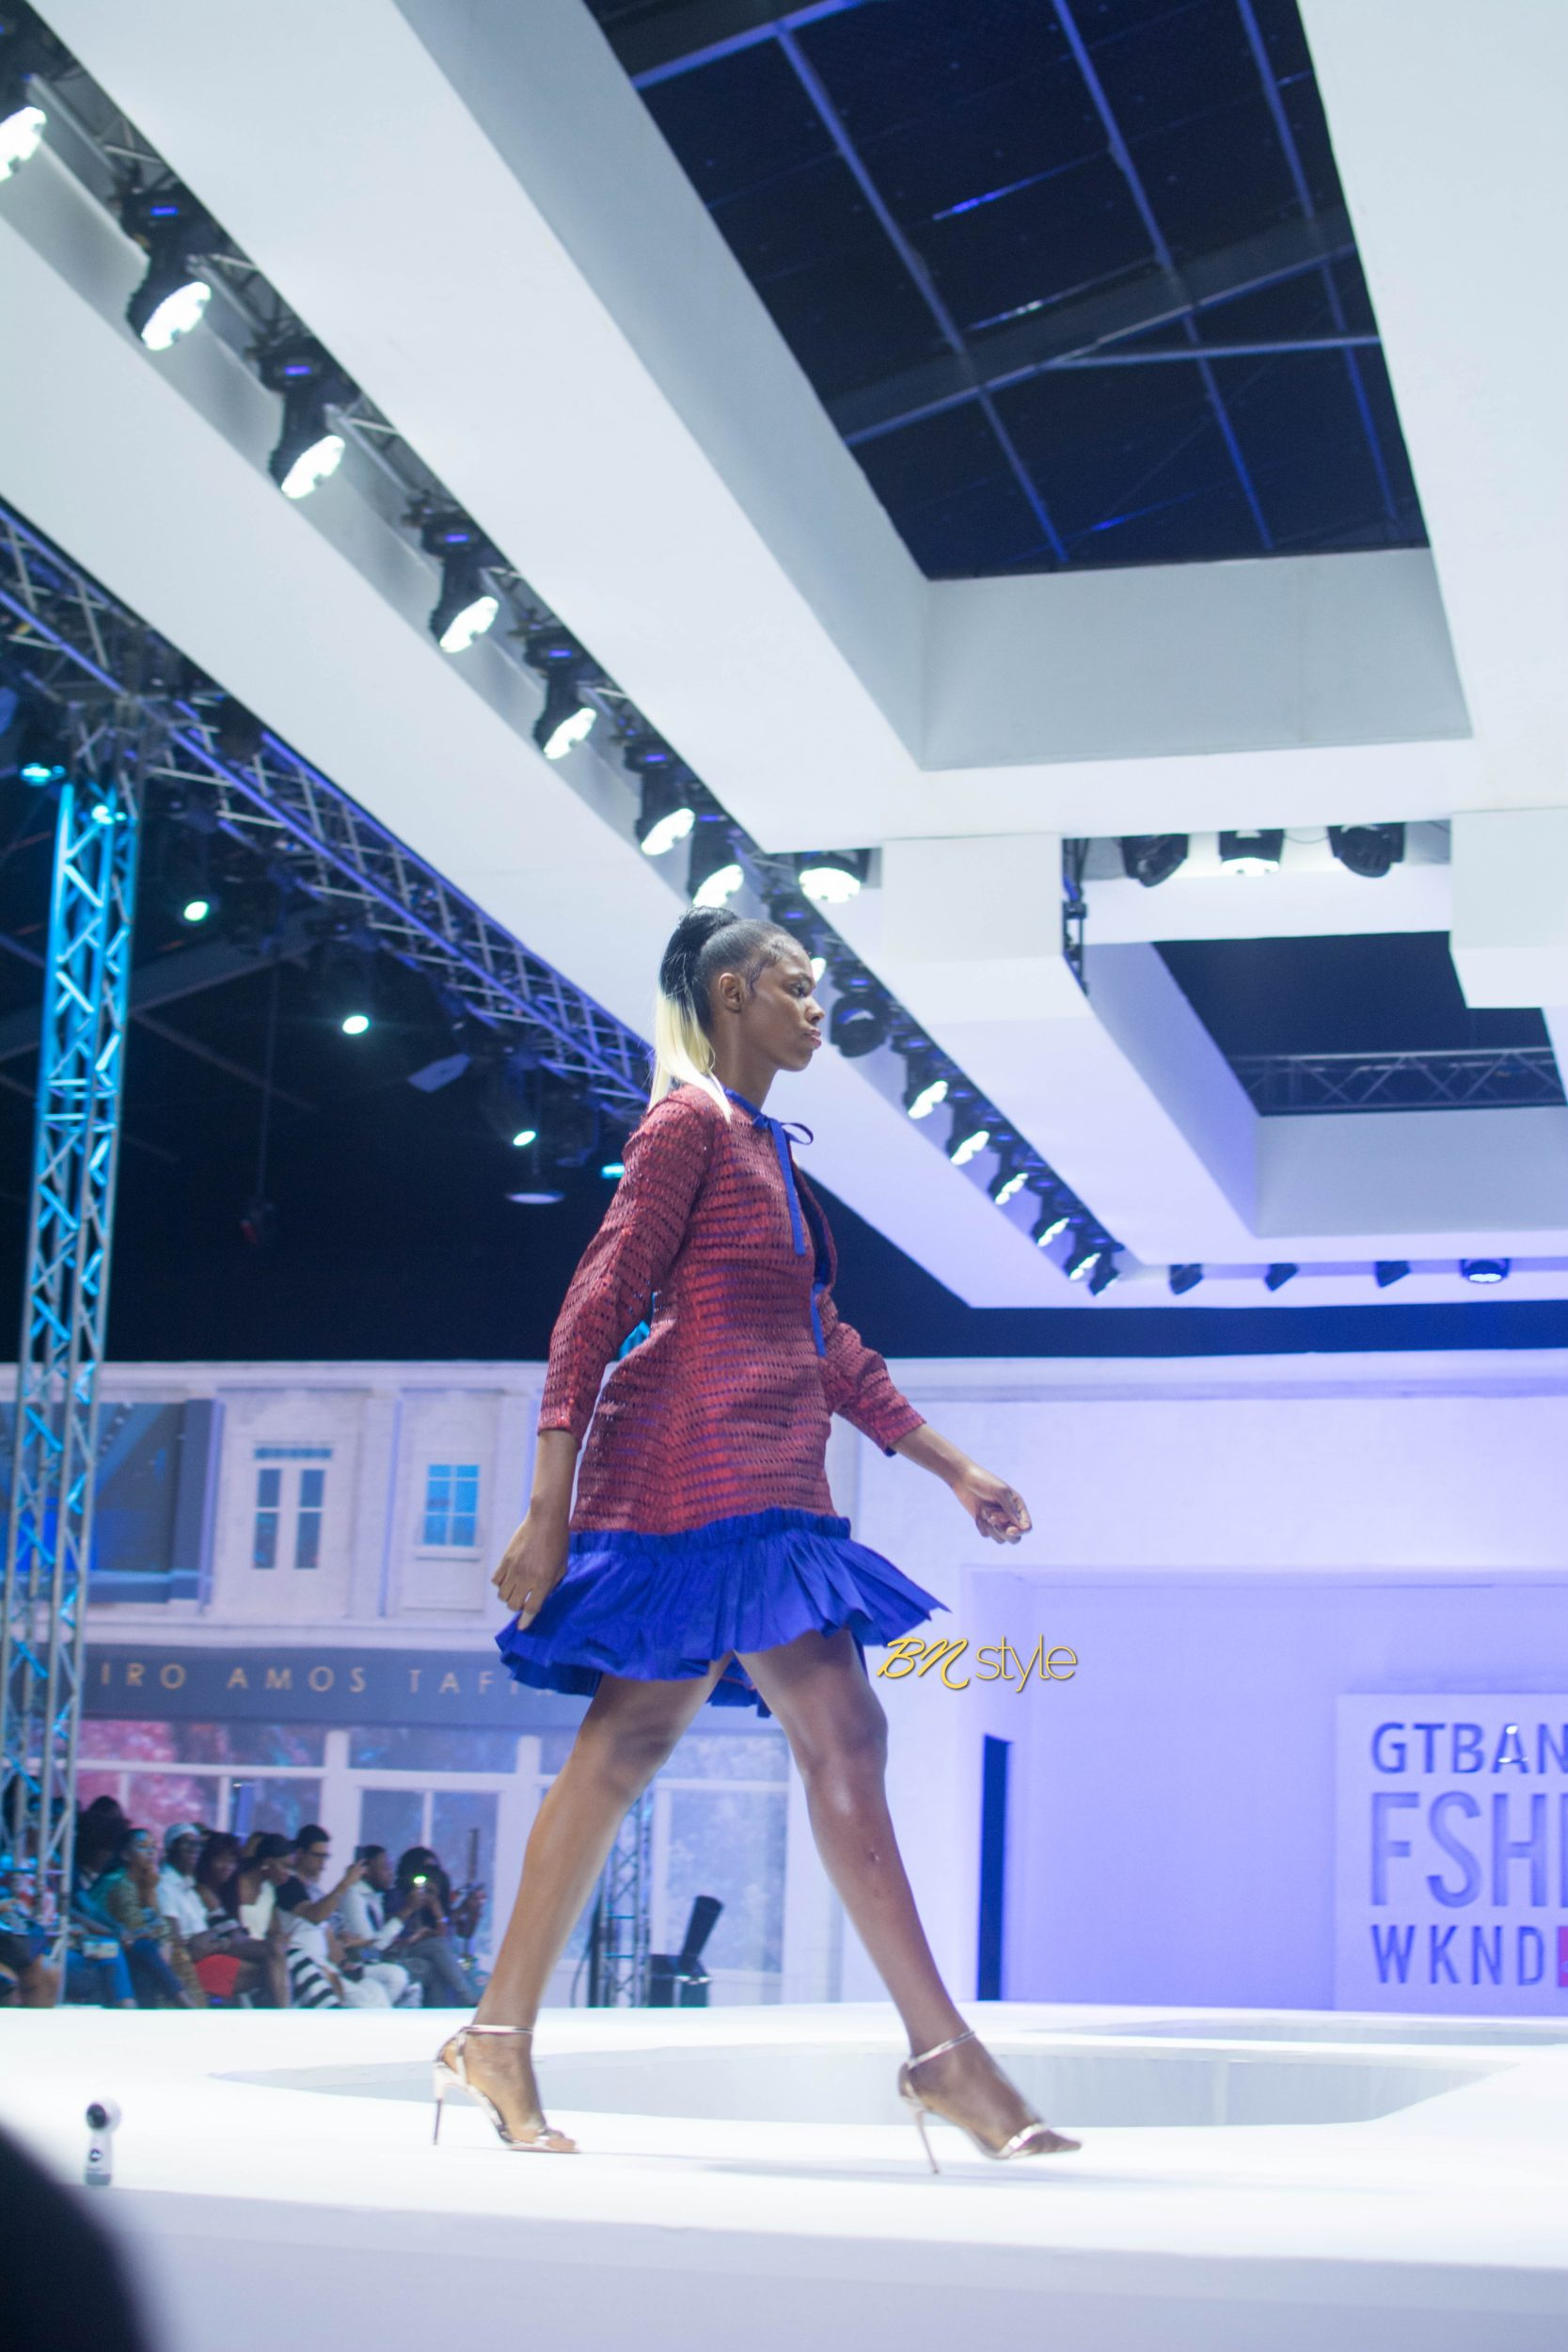 #GTBankFashionWeekend | Ejiro Amos Tafiri